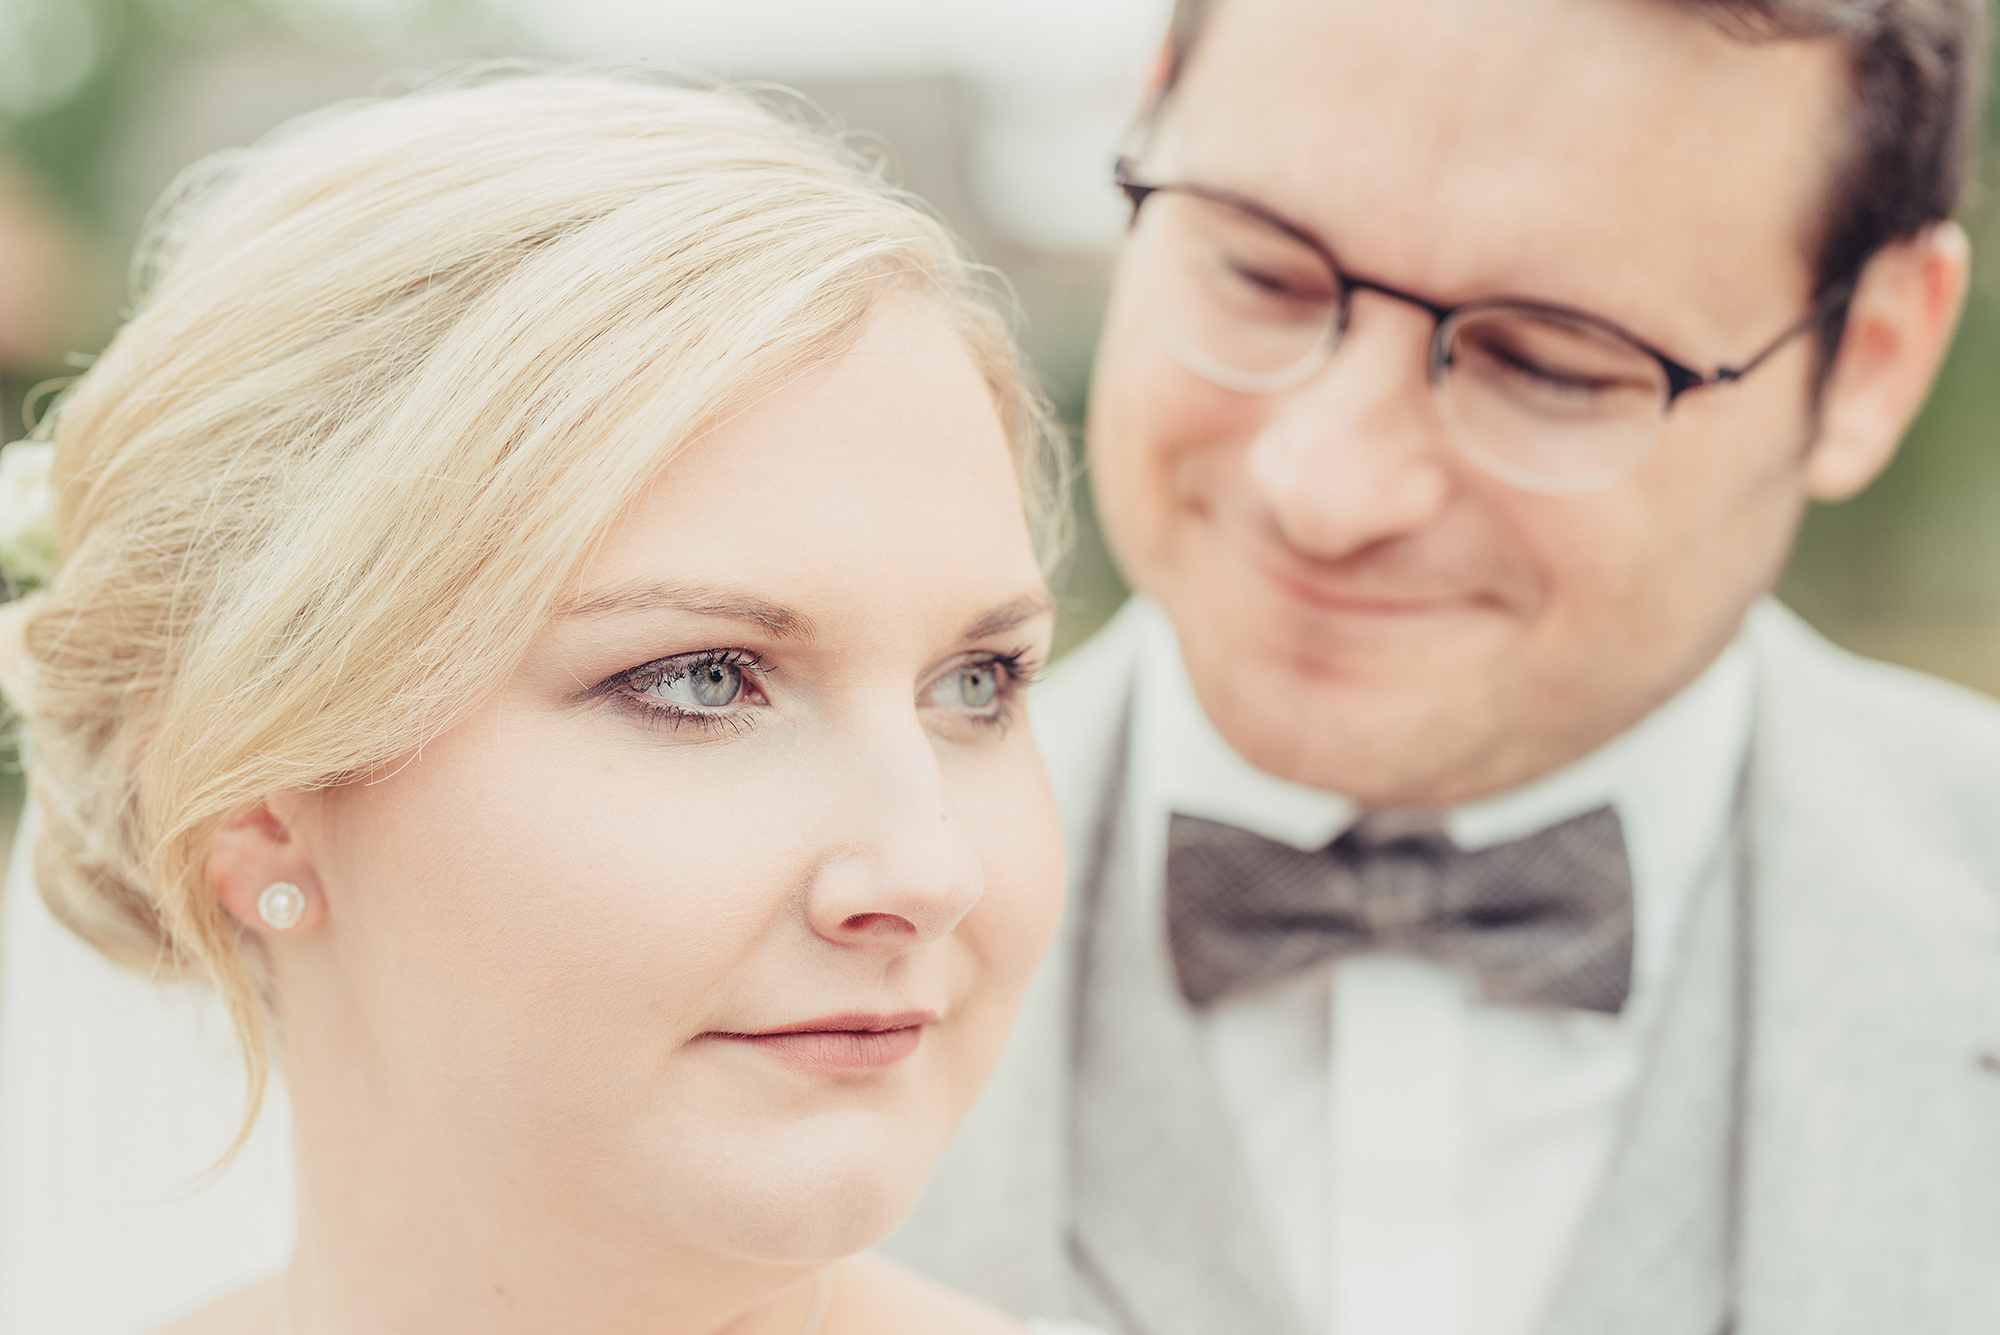 weddingseptemberluminoxx92348234151